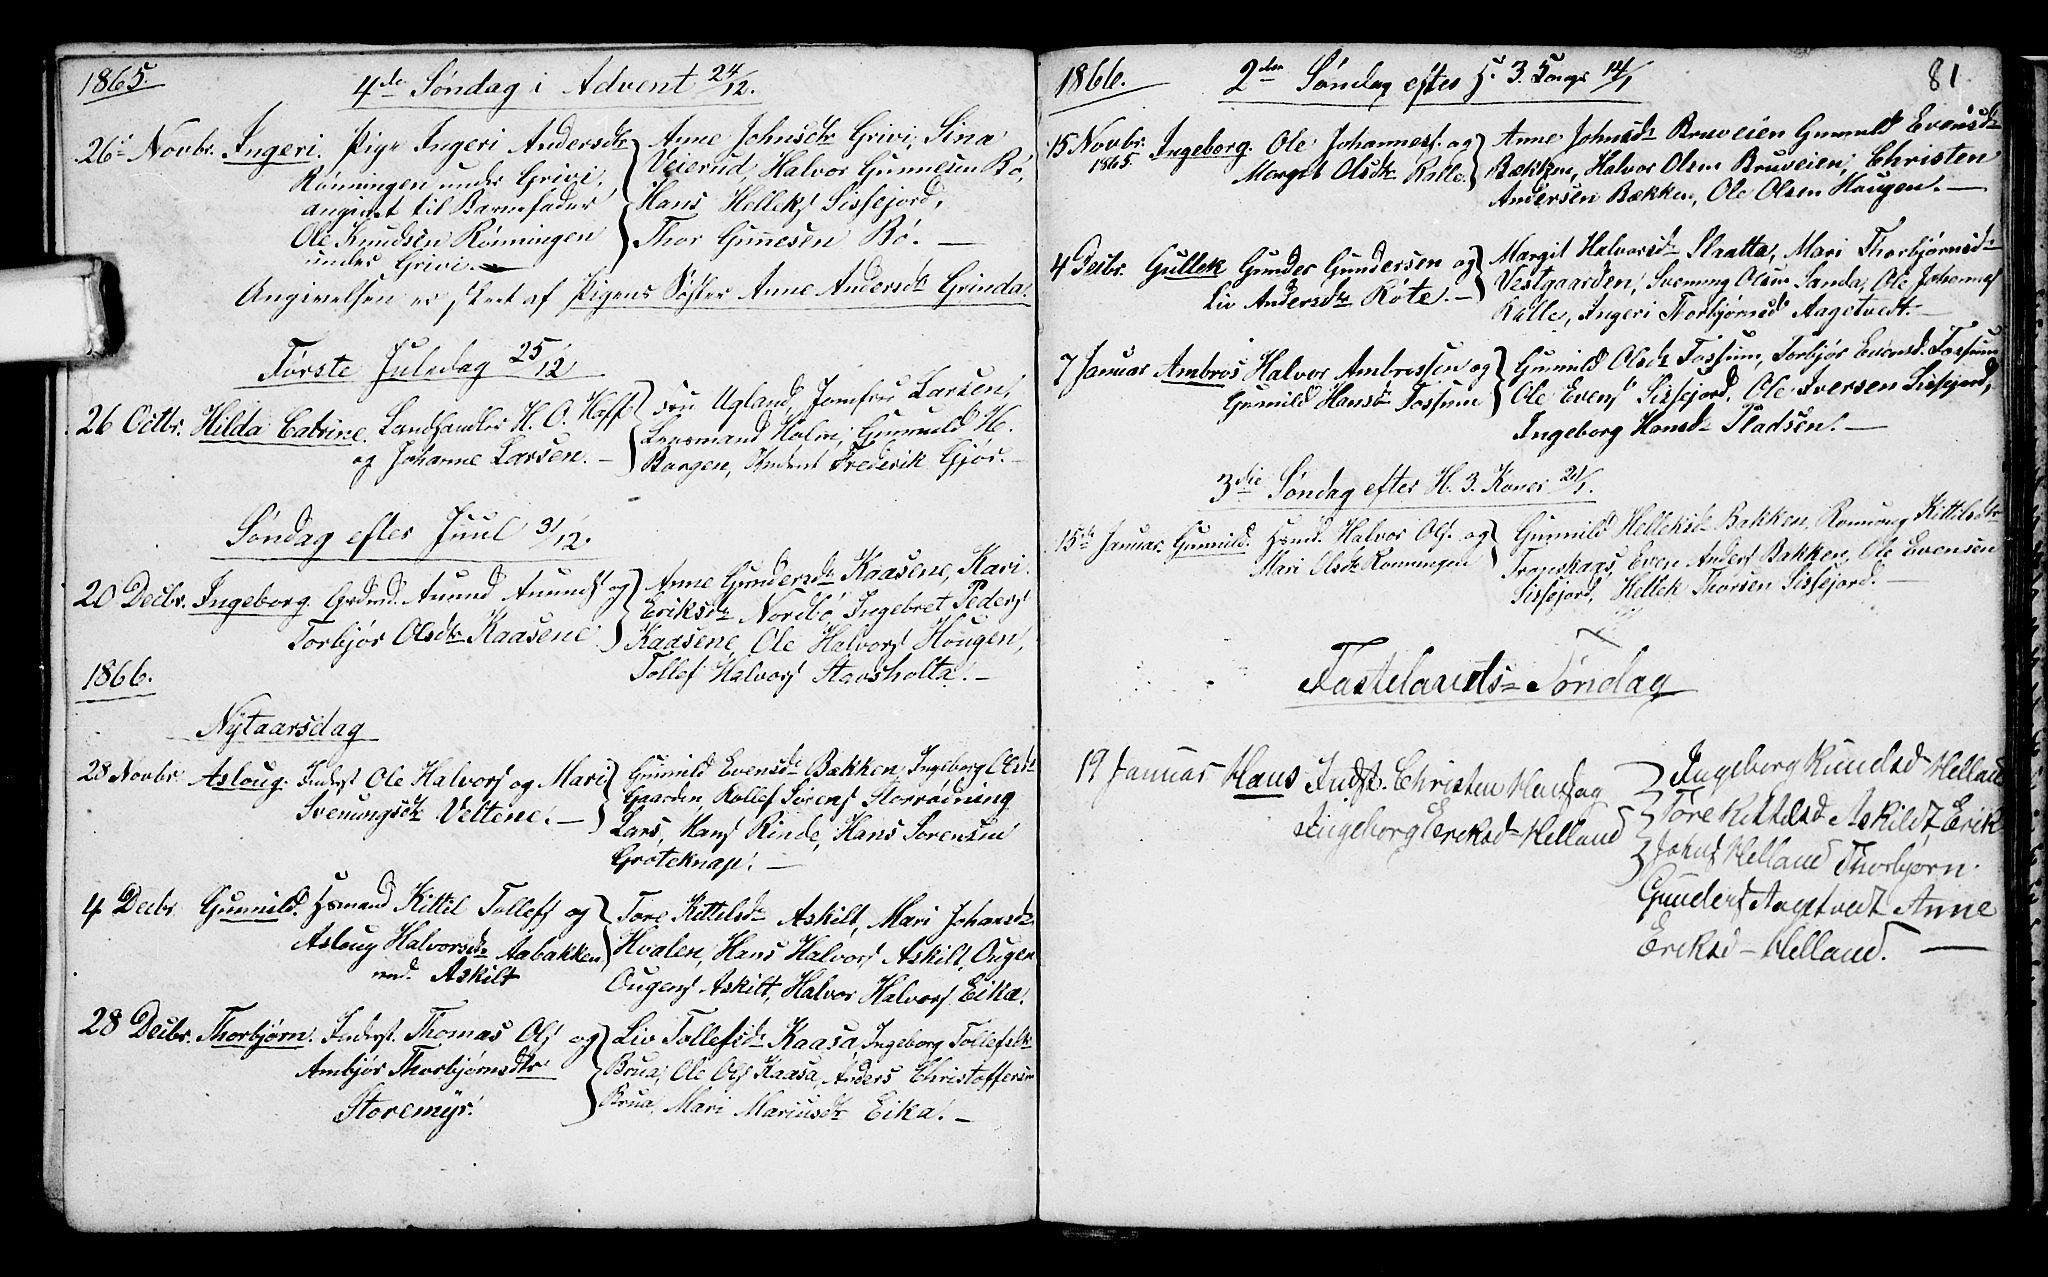 SAKO, Bø kirkebøker, G/Ga/L0002: Klokkerbok nr. 2, 1853-1866, s. 81